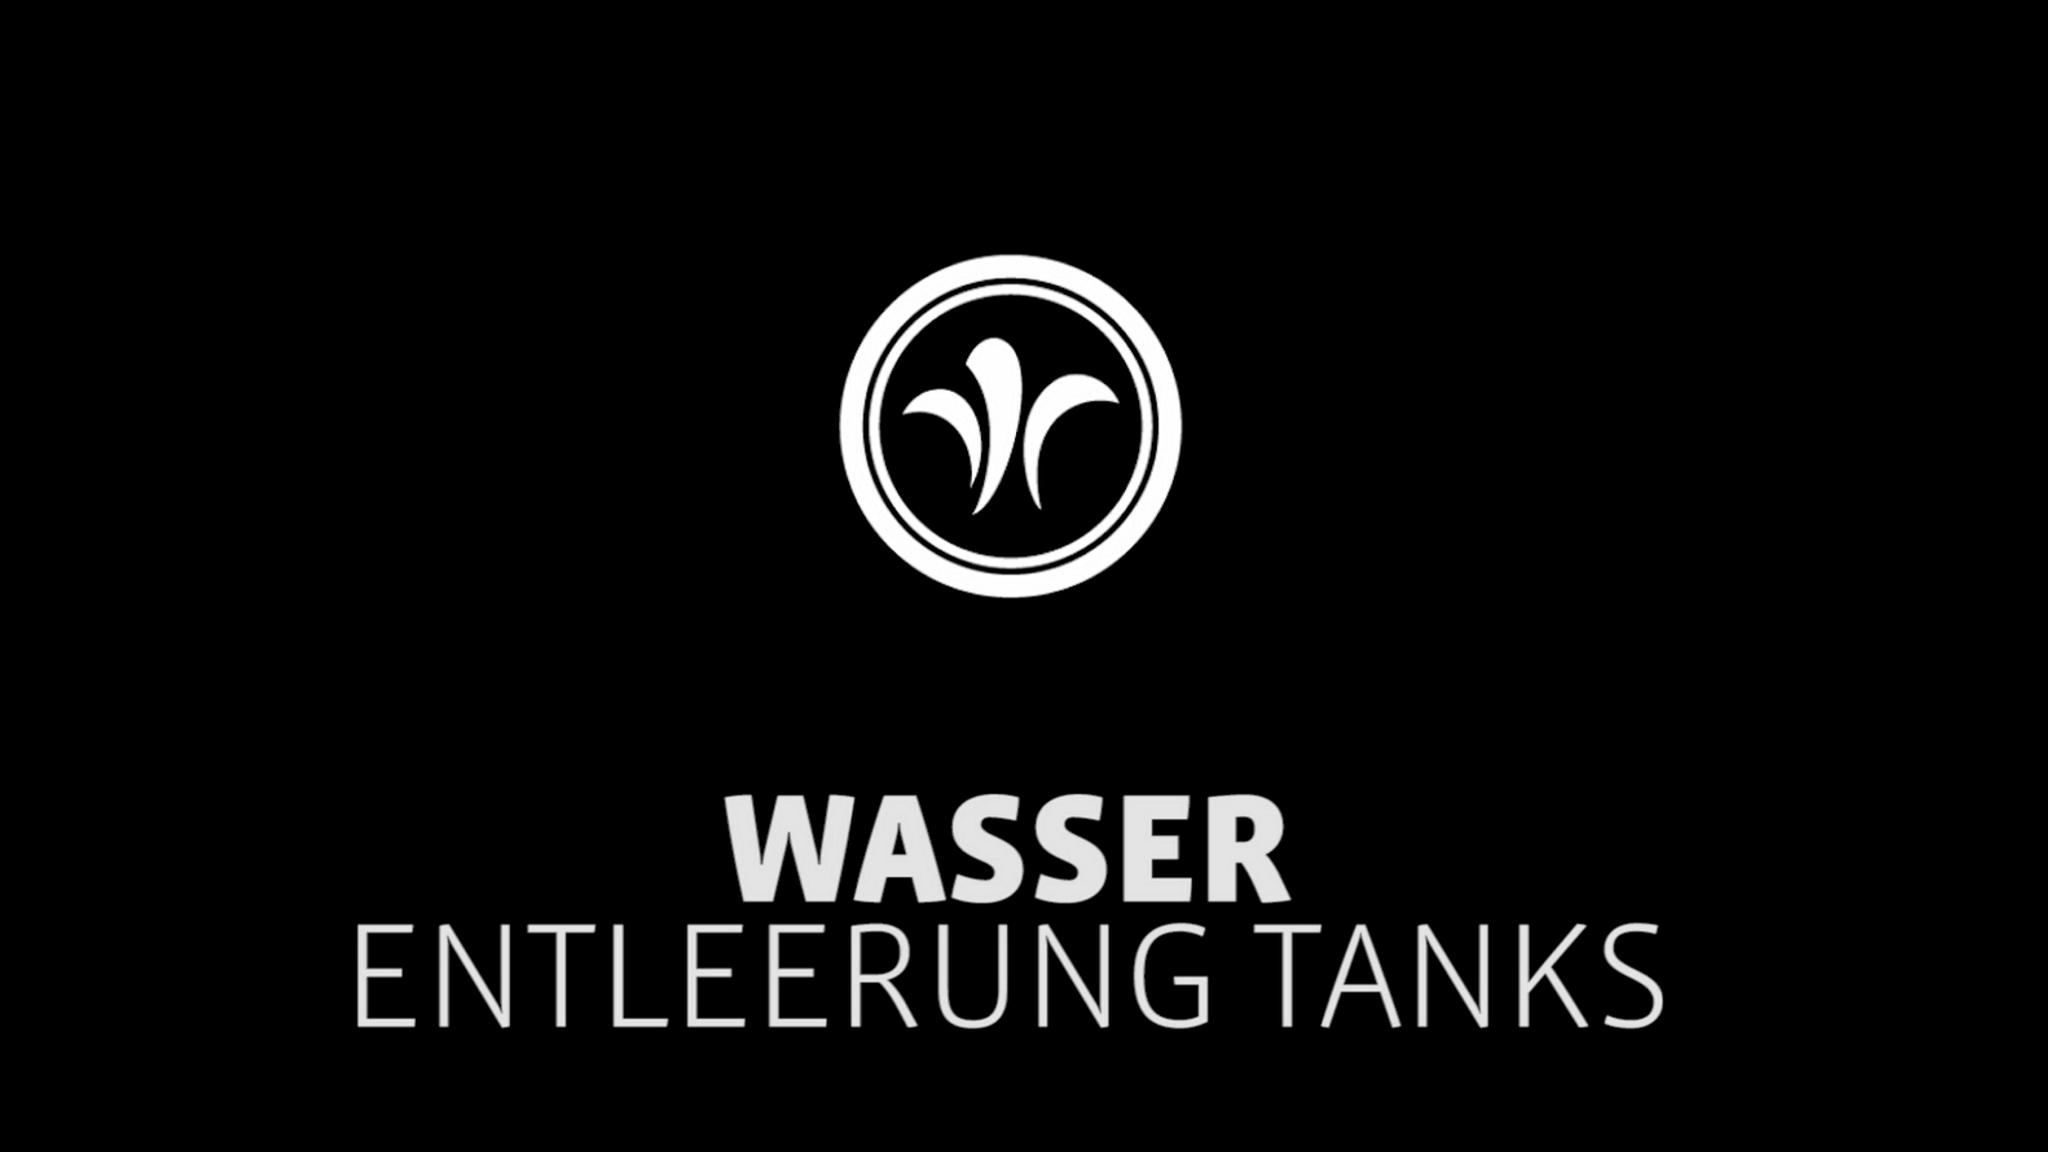 Wohnmobil Entleerung Tanks // Niesmann+Bischoff – Reisemobil (Modell ARTO) // 2019 // WA5